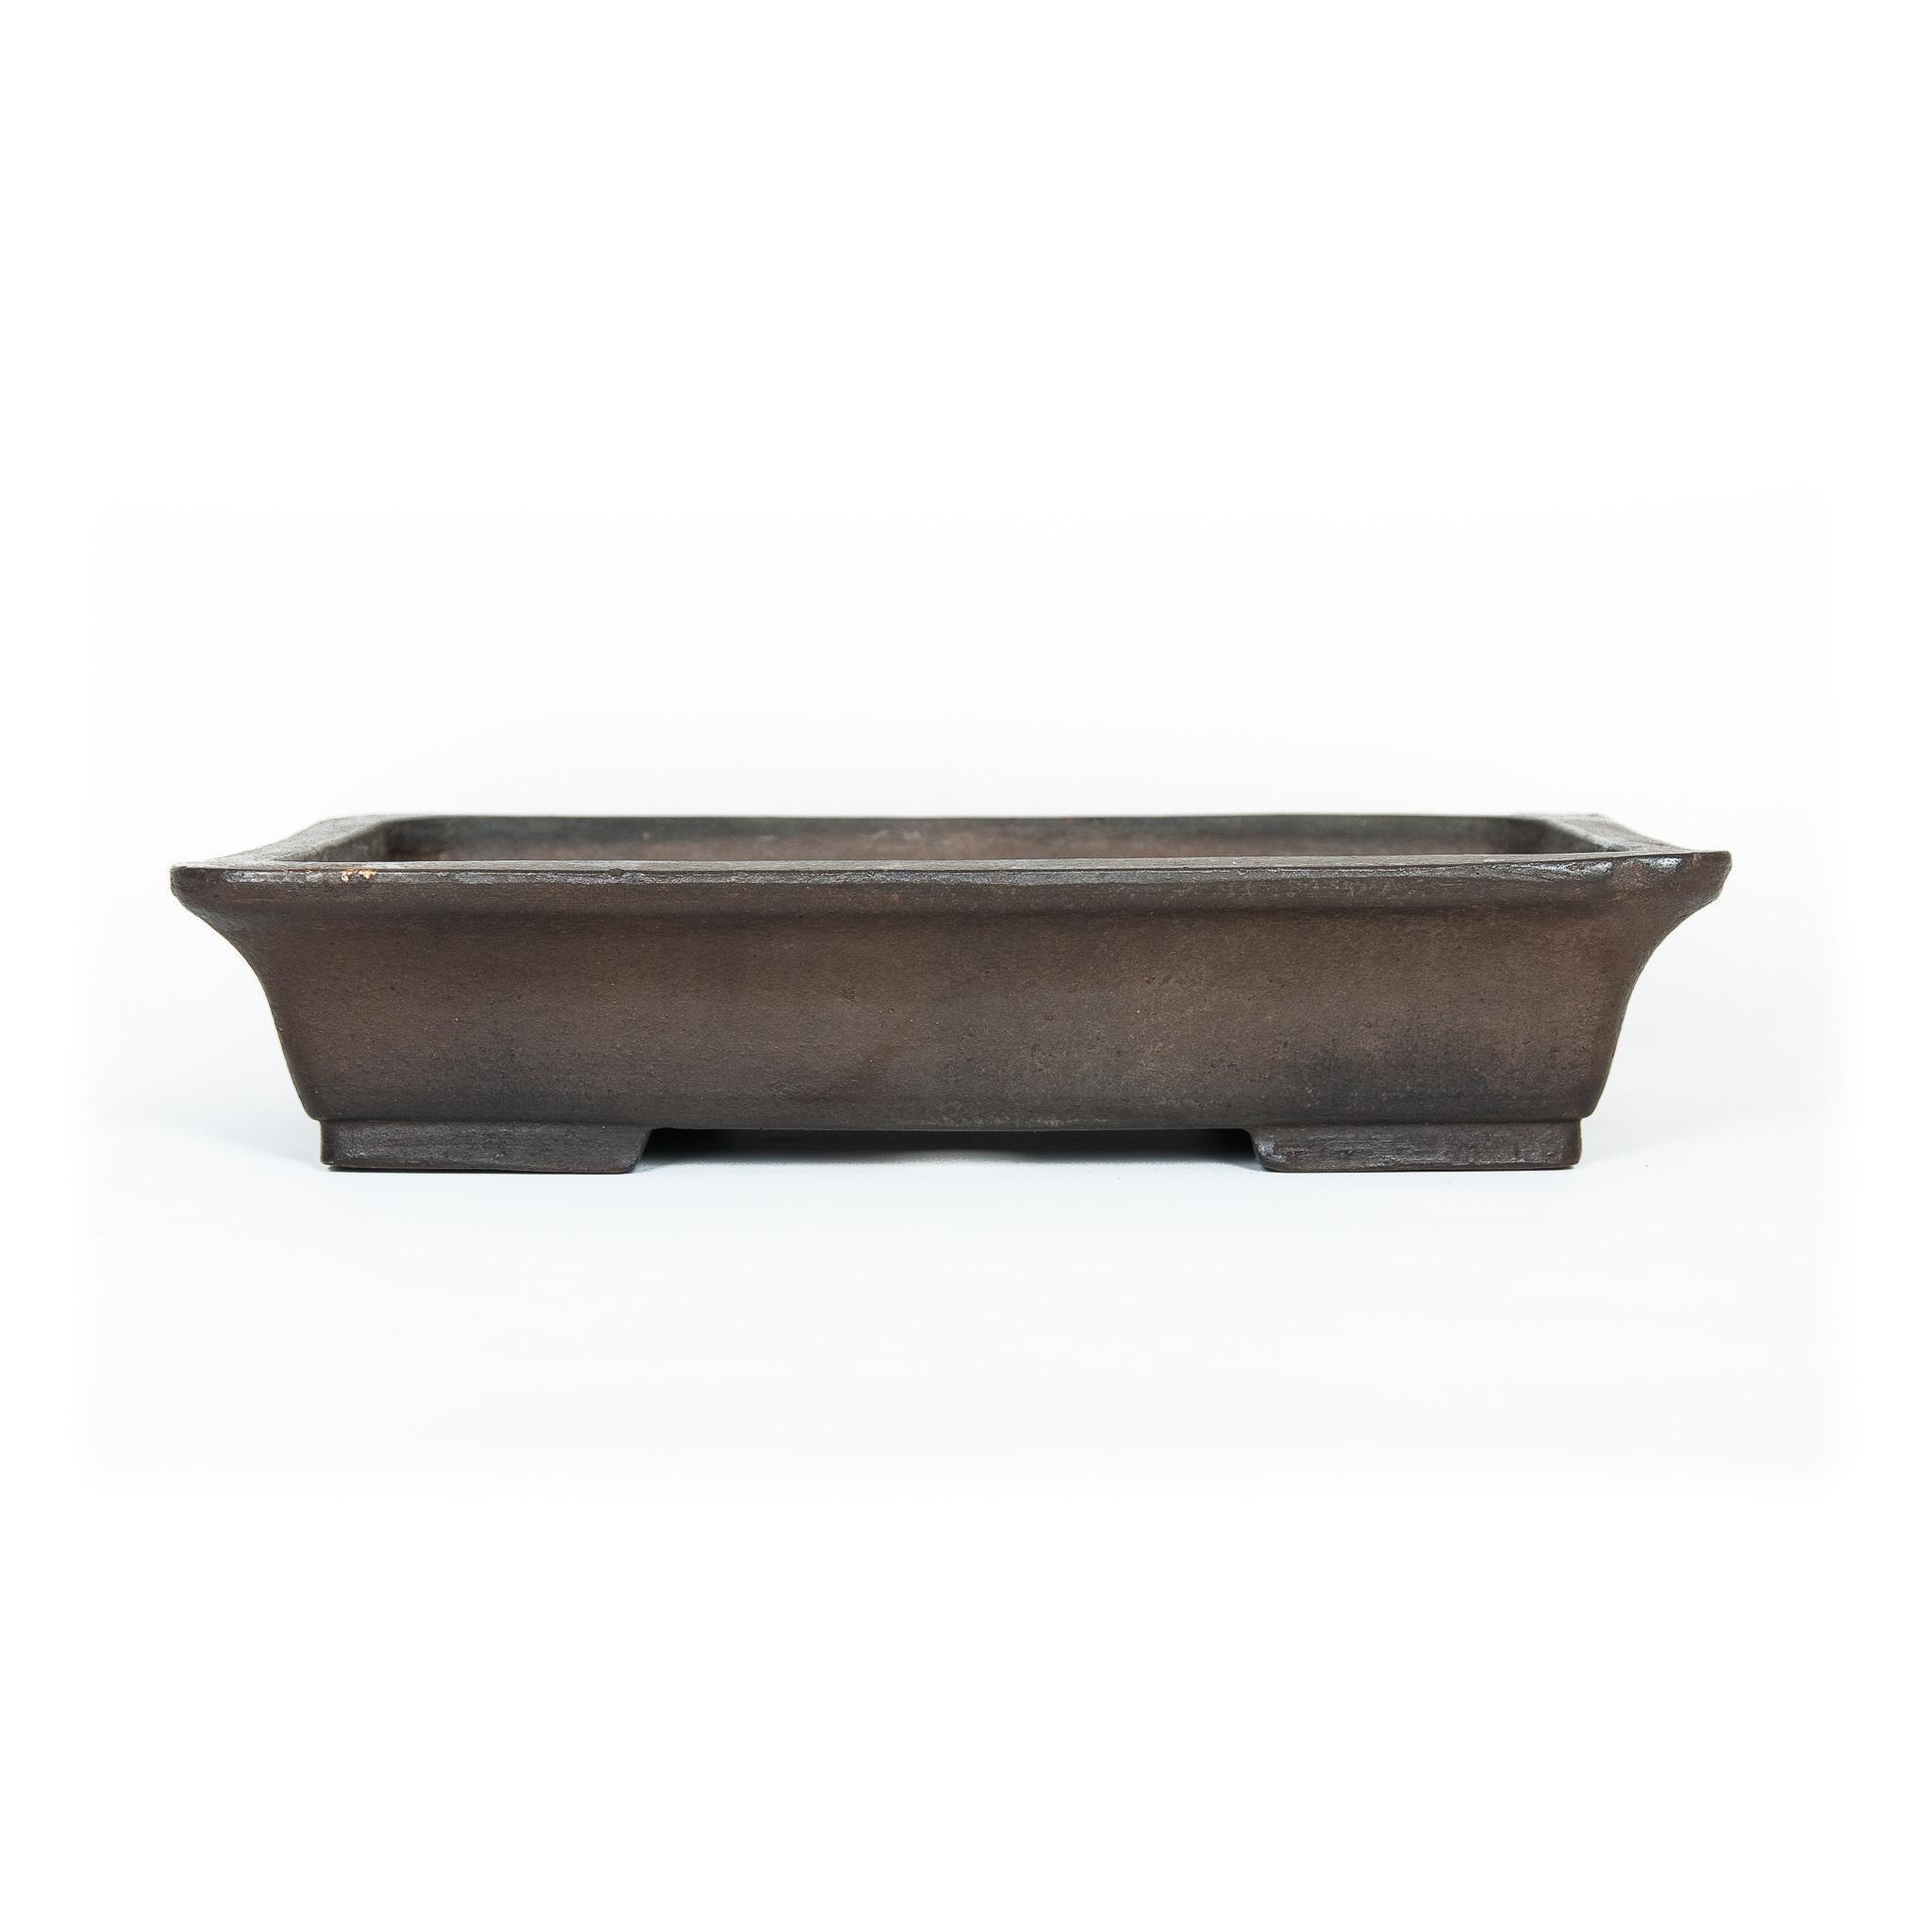 Bonsai Pot China Nakawatari Used